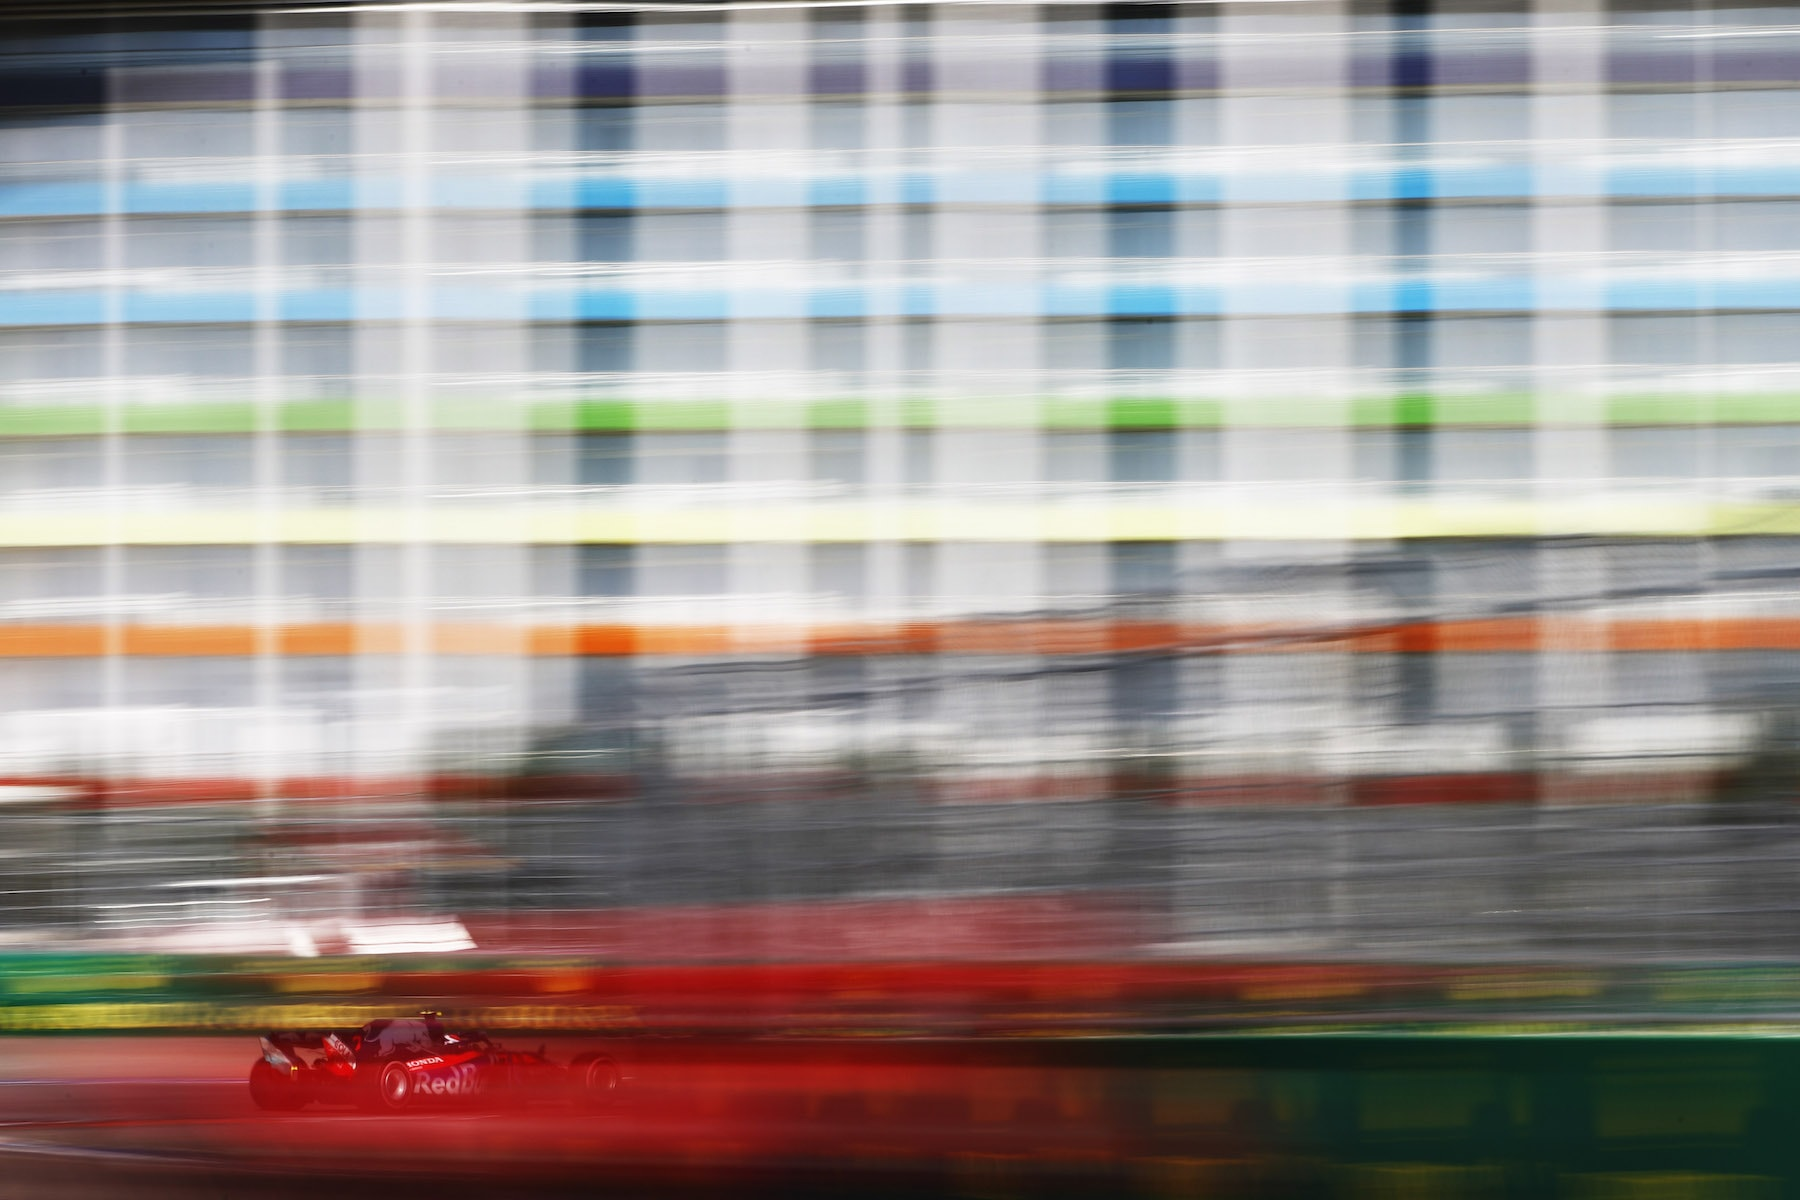 2018 Pierre Gasly | Toro Rosso STR13 | 2018 Russain GP Q1 1 copy.jpg